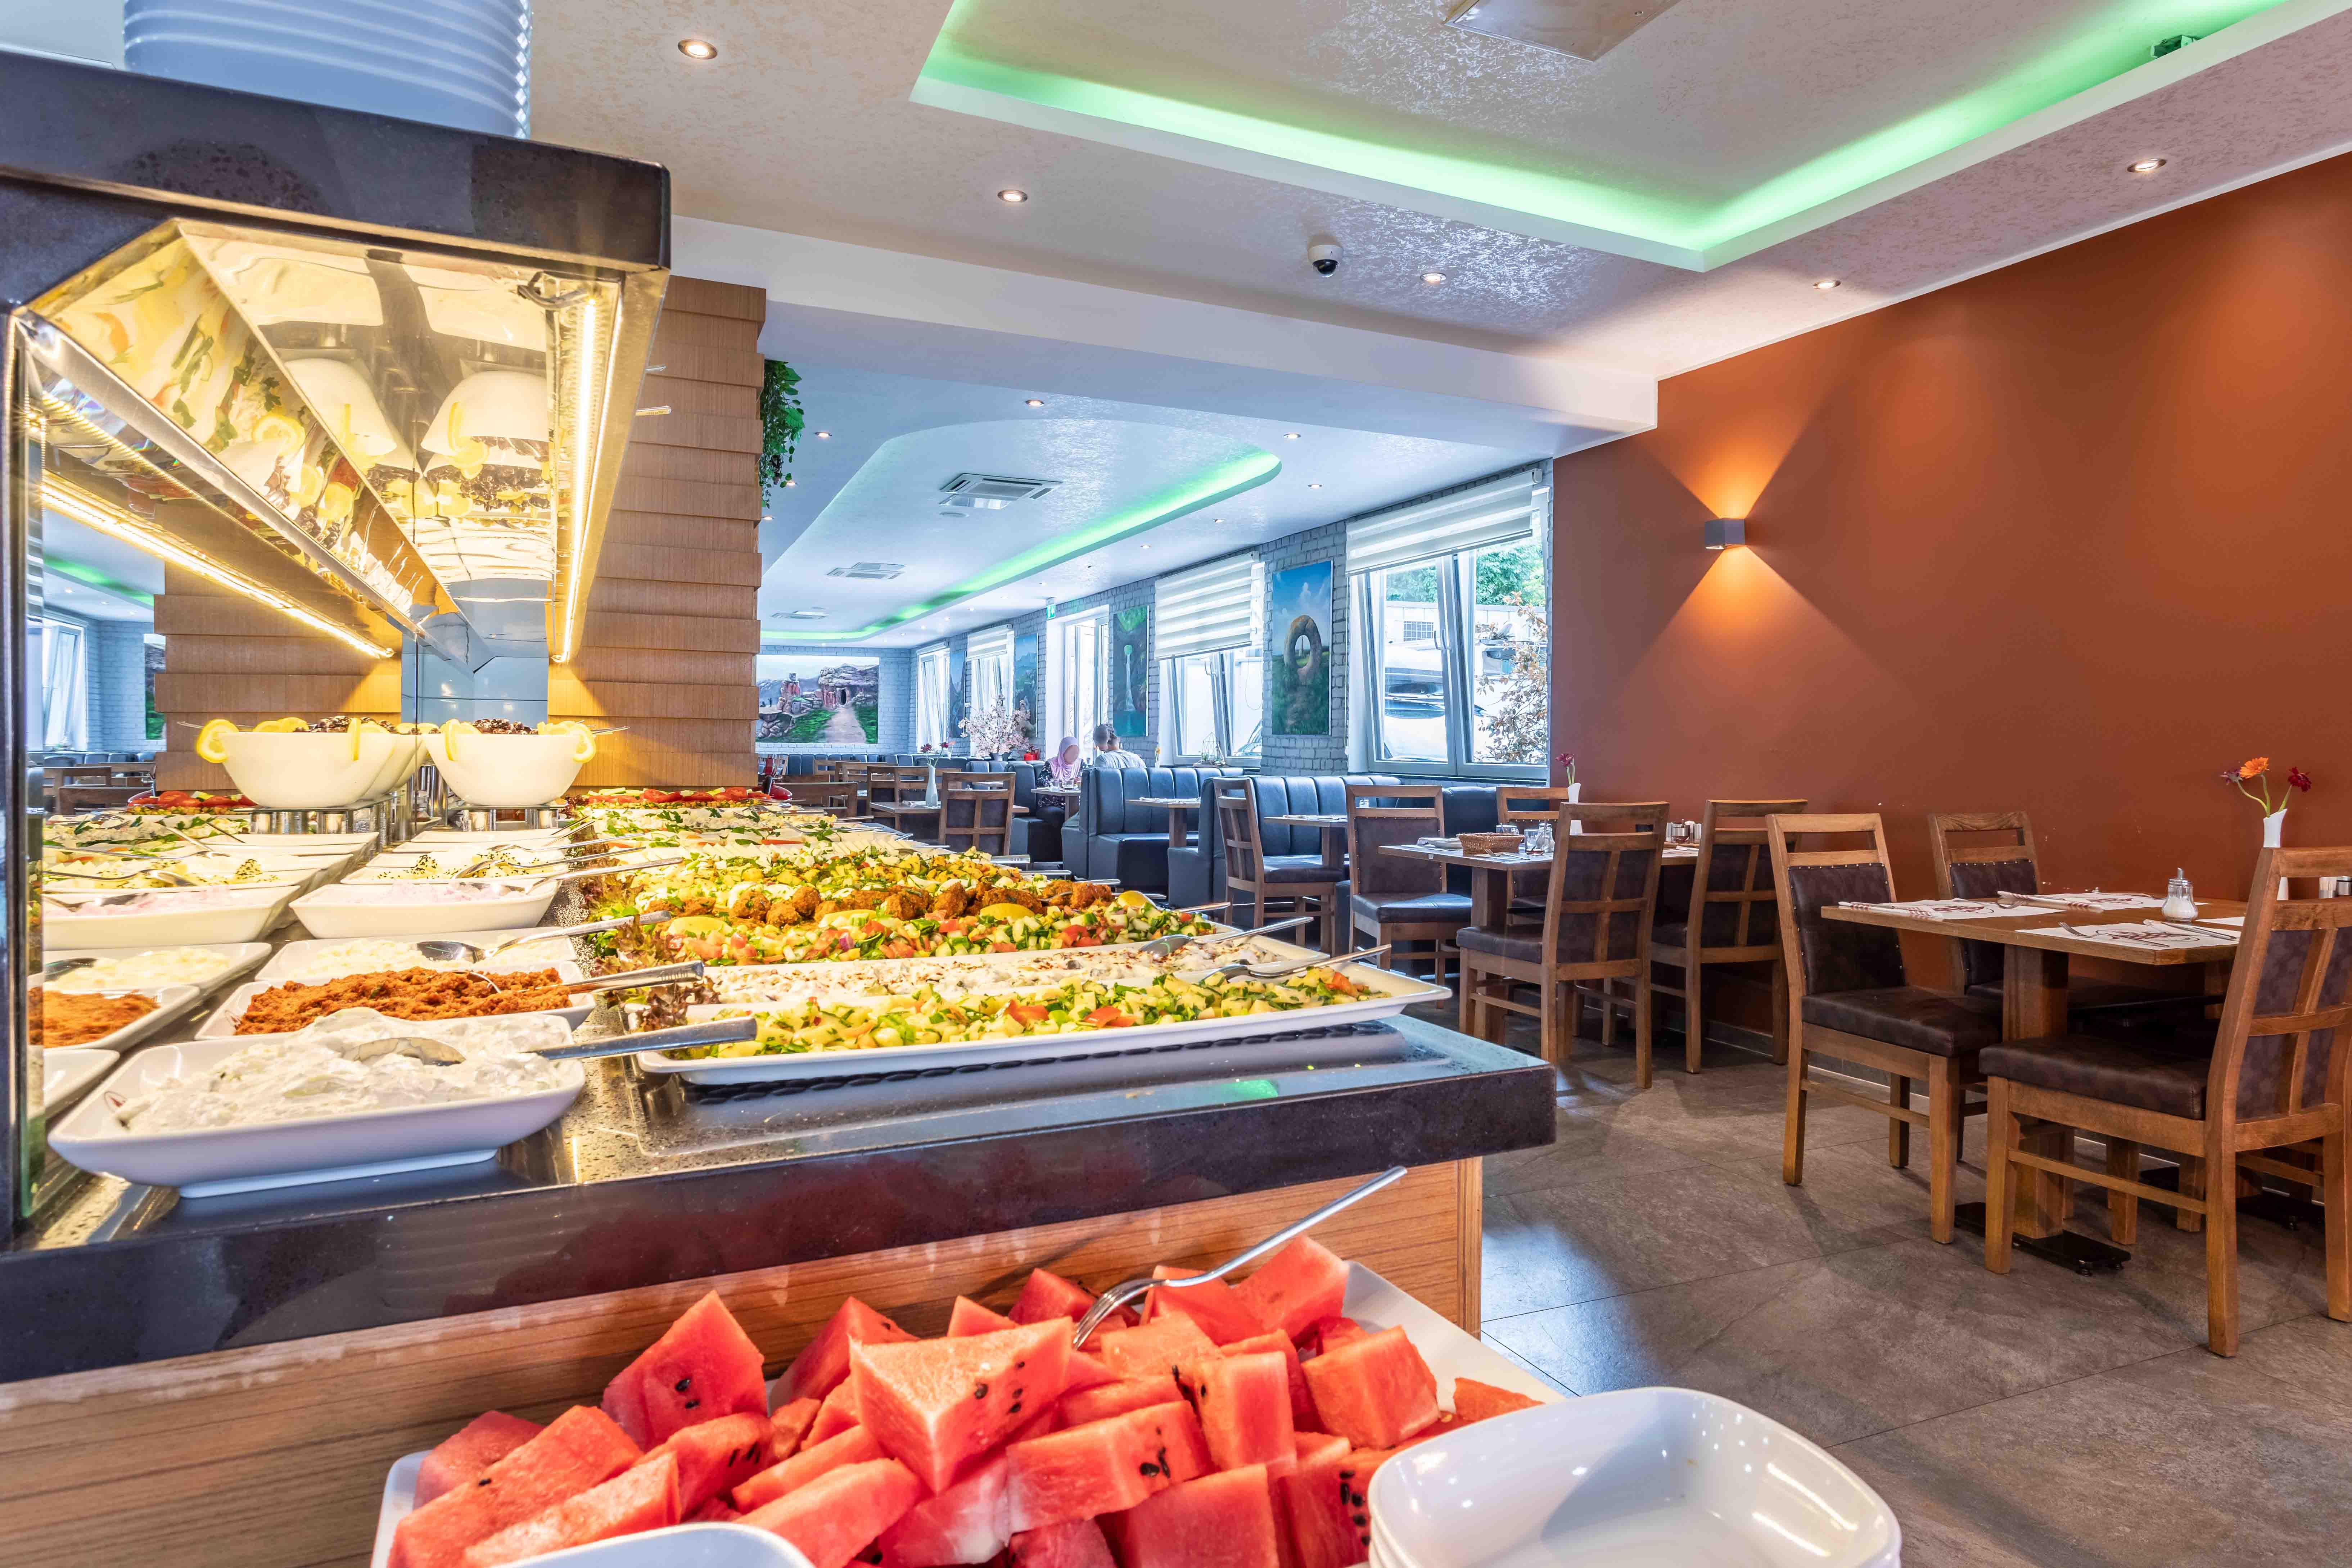 Fotos de Tandir Restaurant Köln